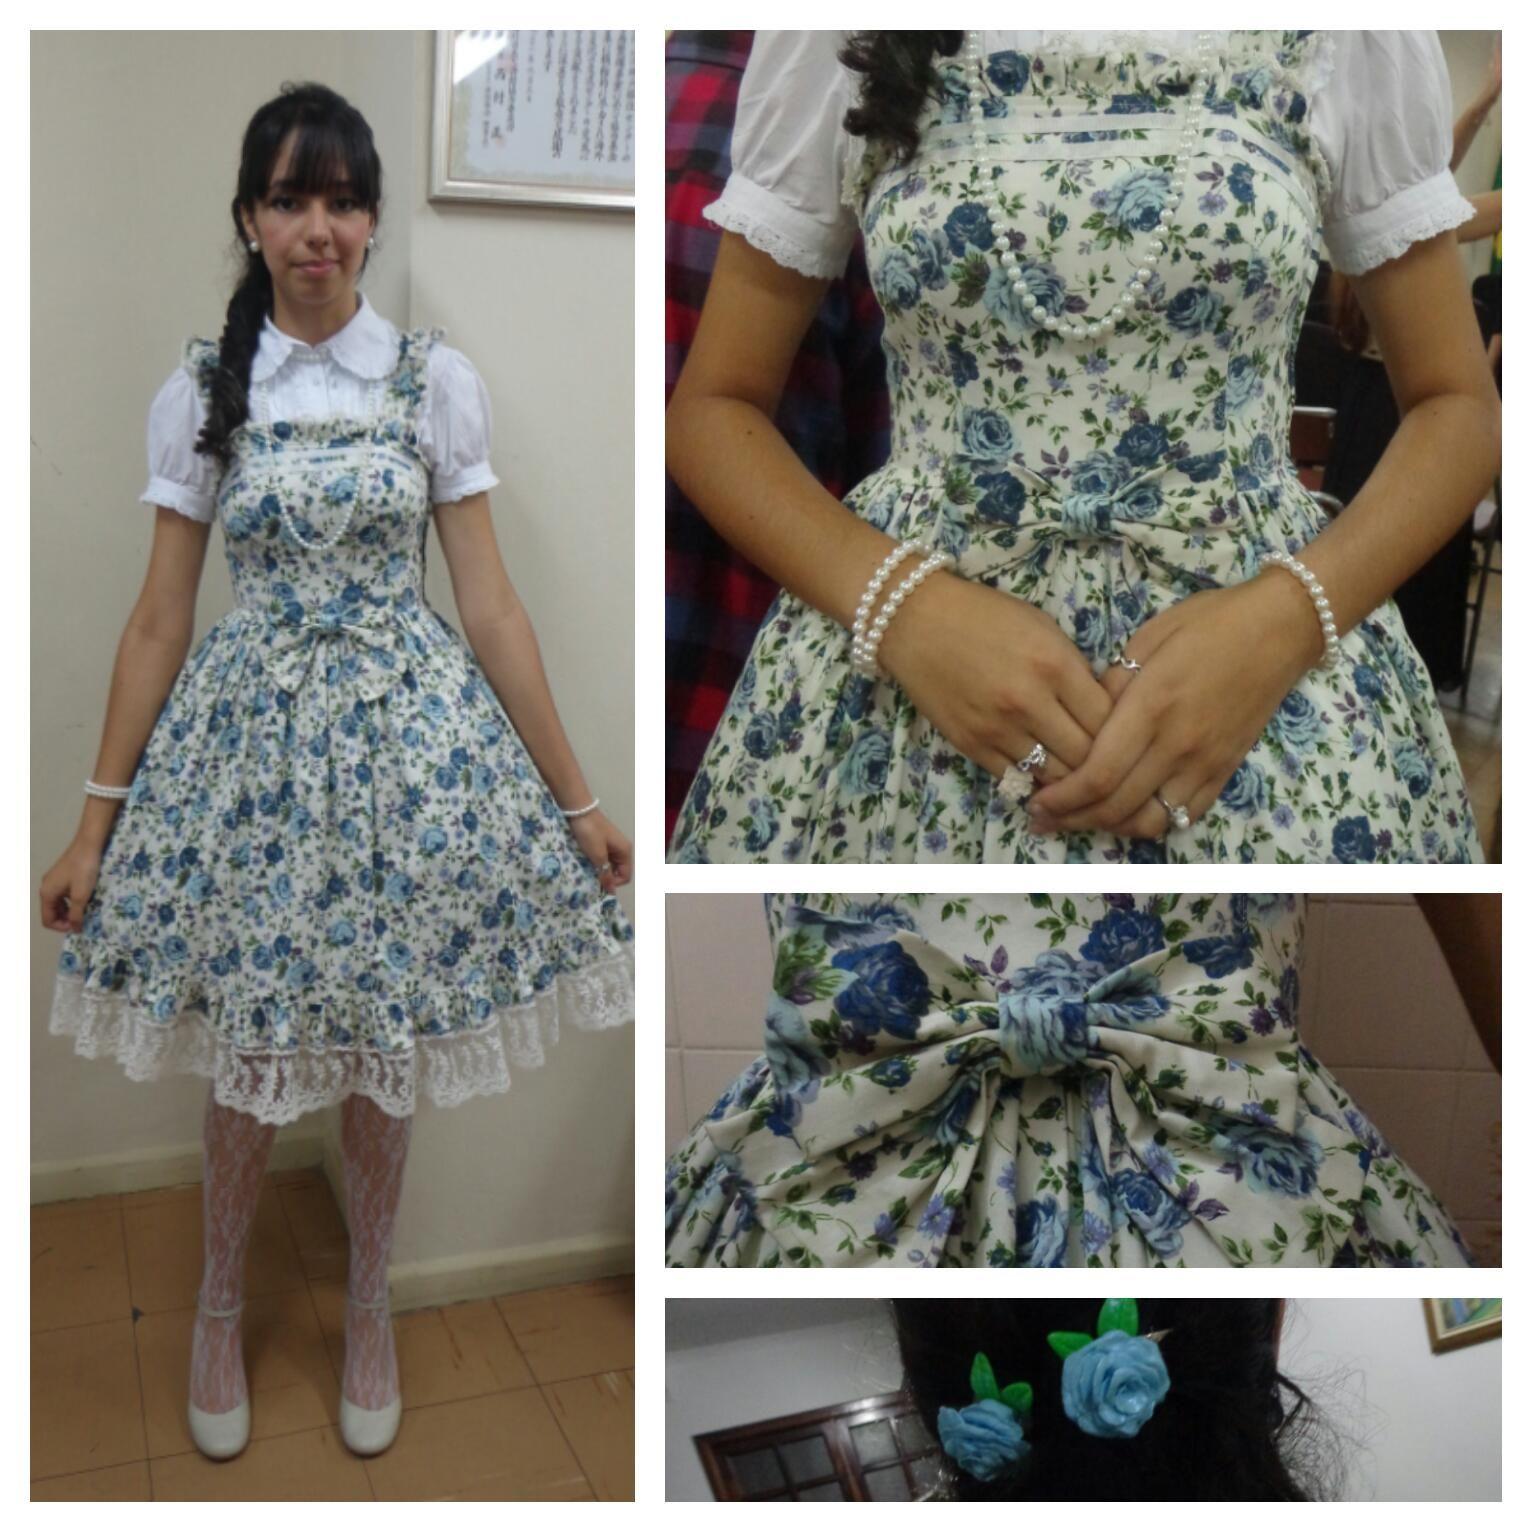 #coord #coordenate #outfit #harajuku #japanstreetfashion #Lolitafashion #bodyline